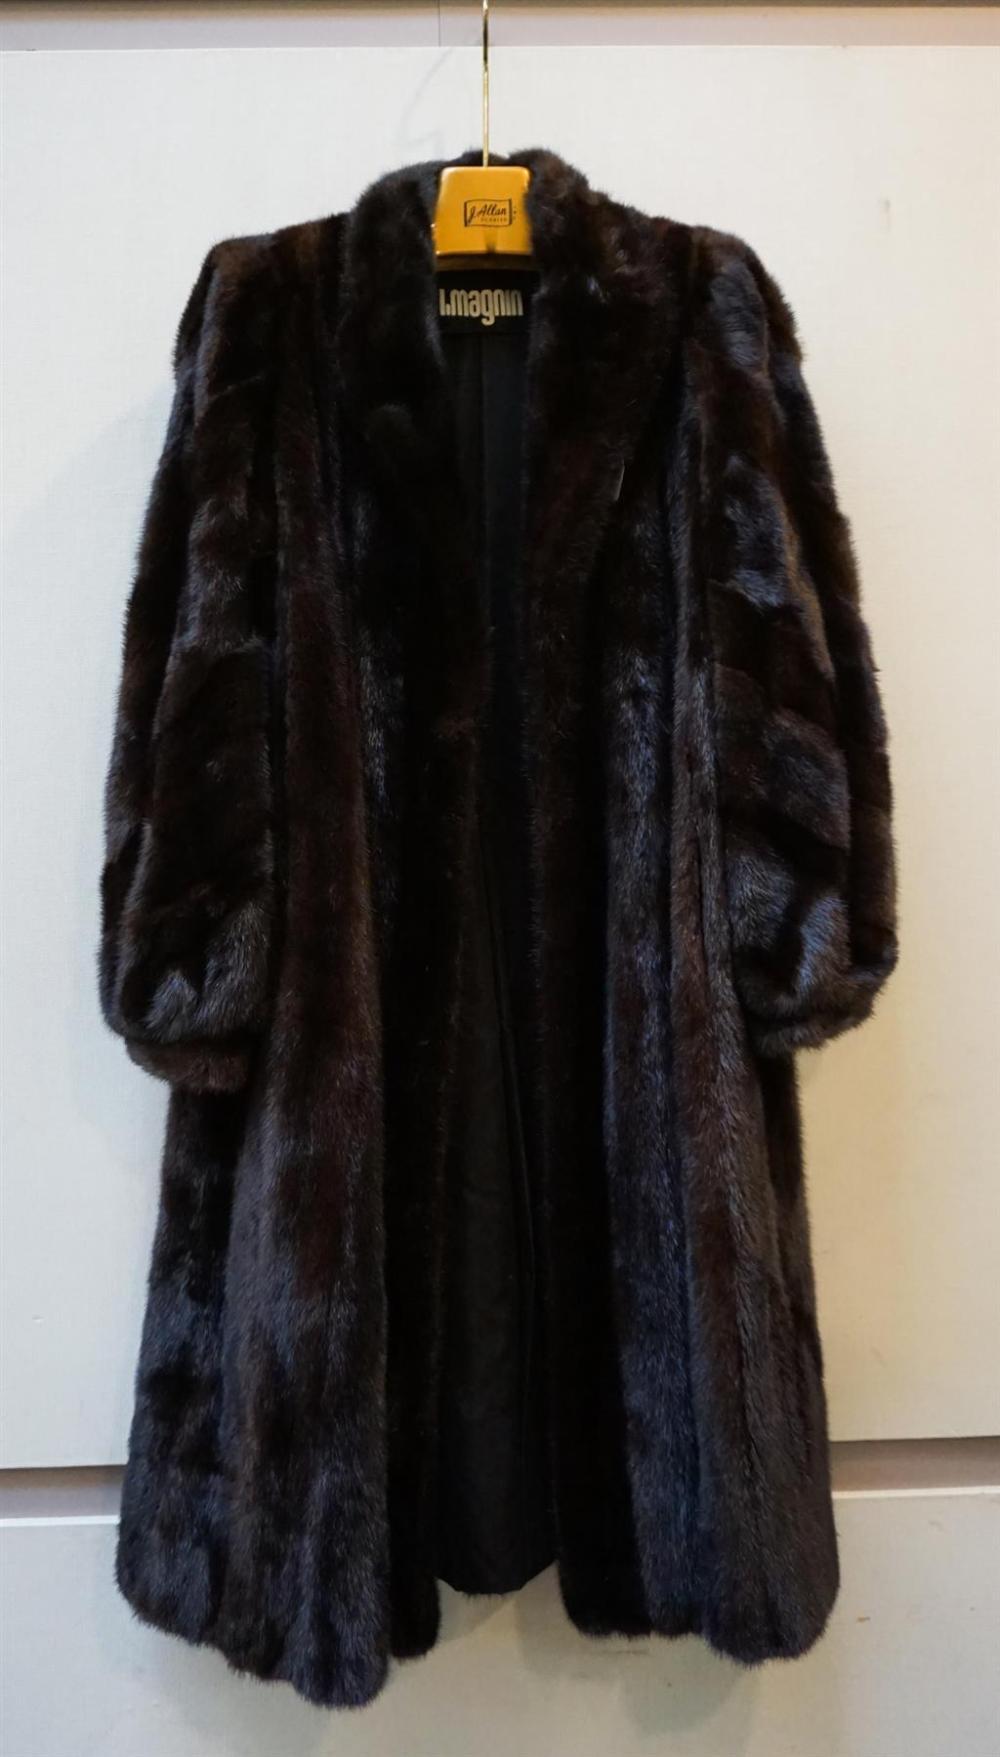 Full-Length Ranch Mink Coat Retailed by I. Magnin